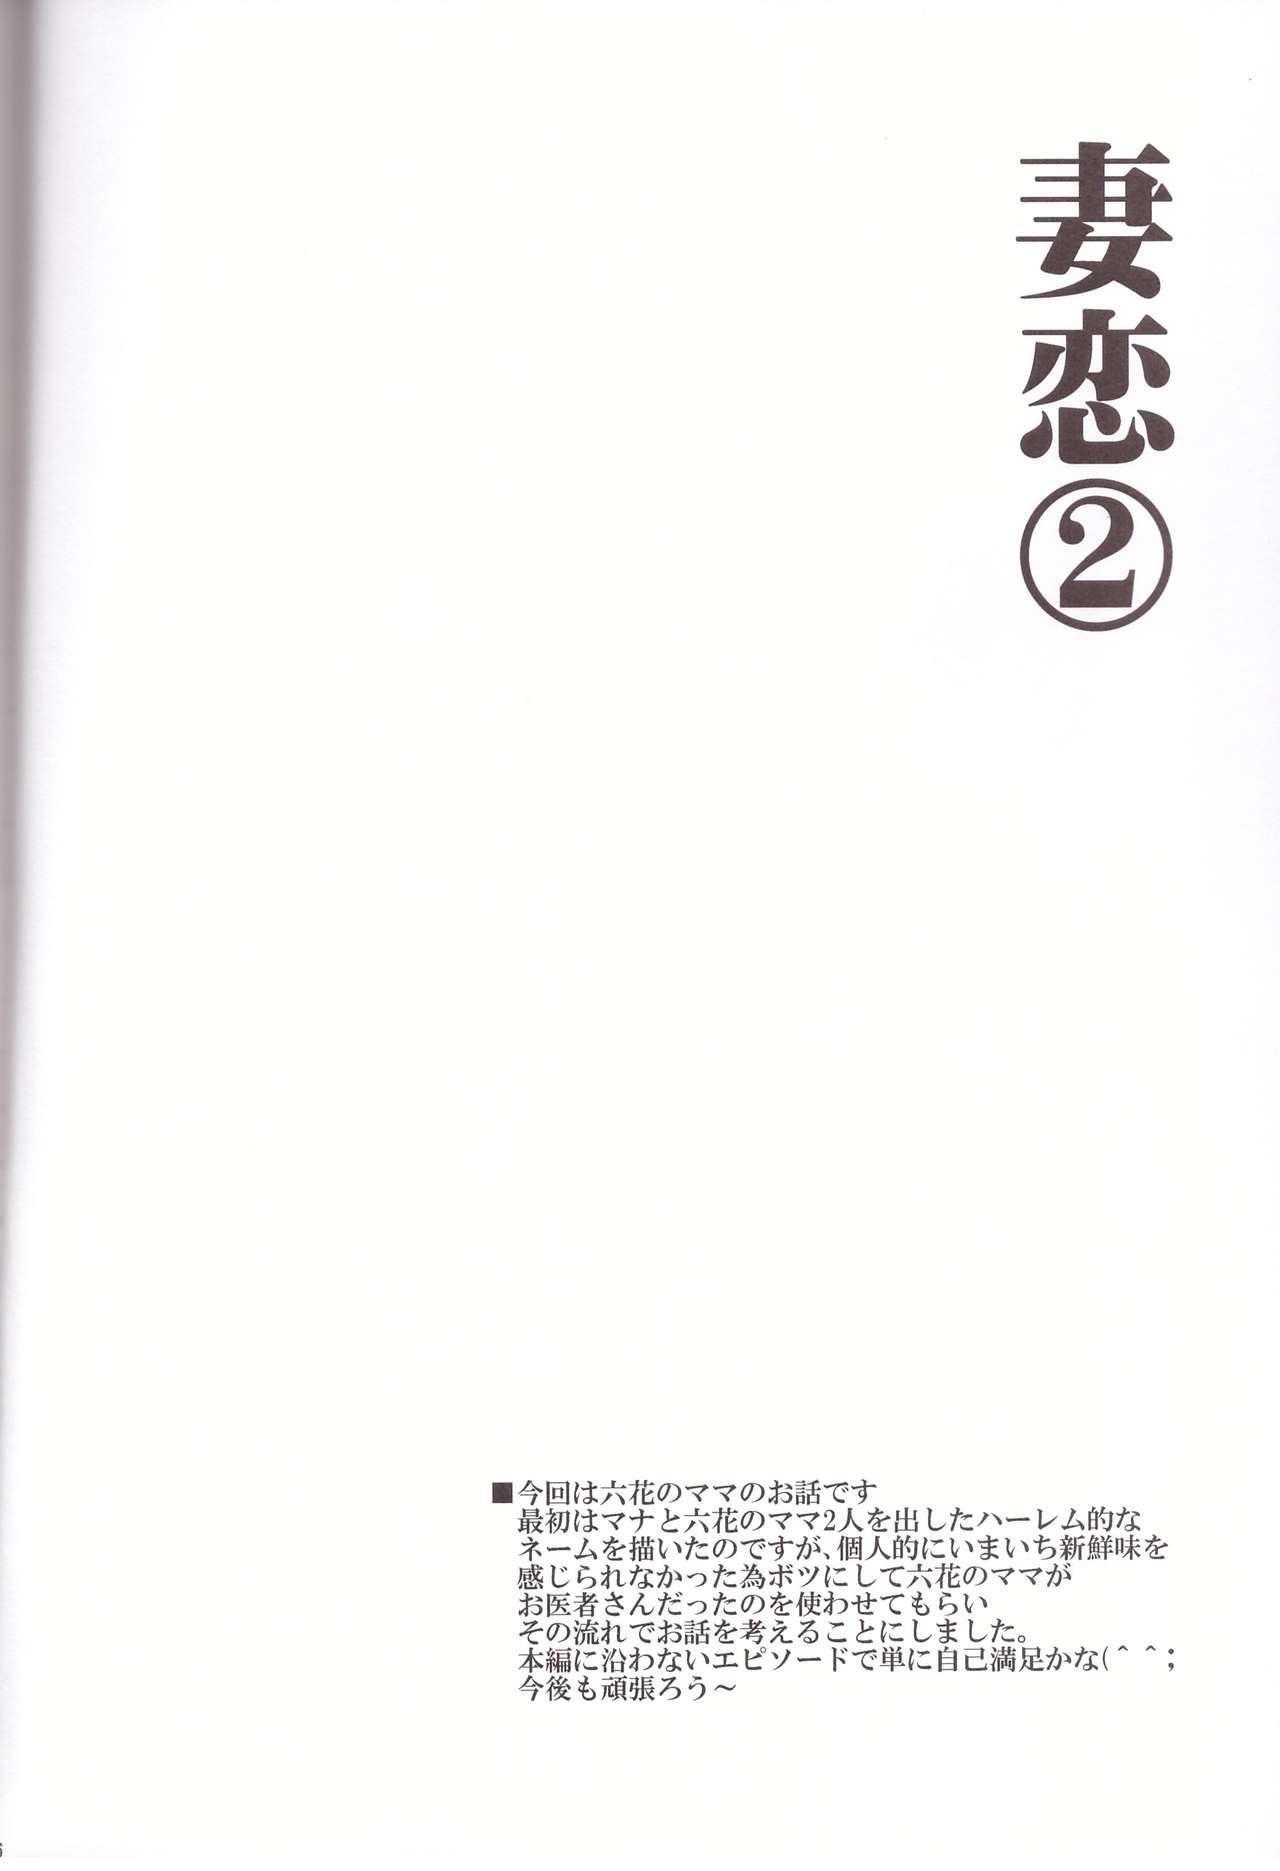 Tsuma koi2 5